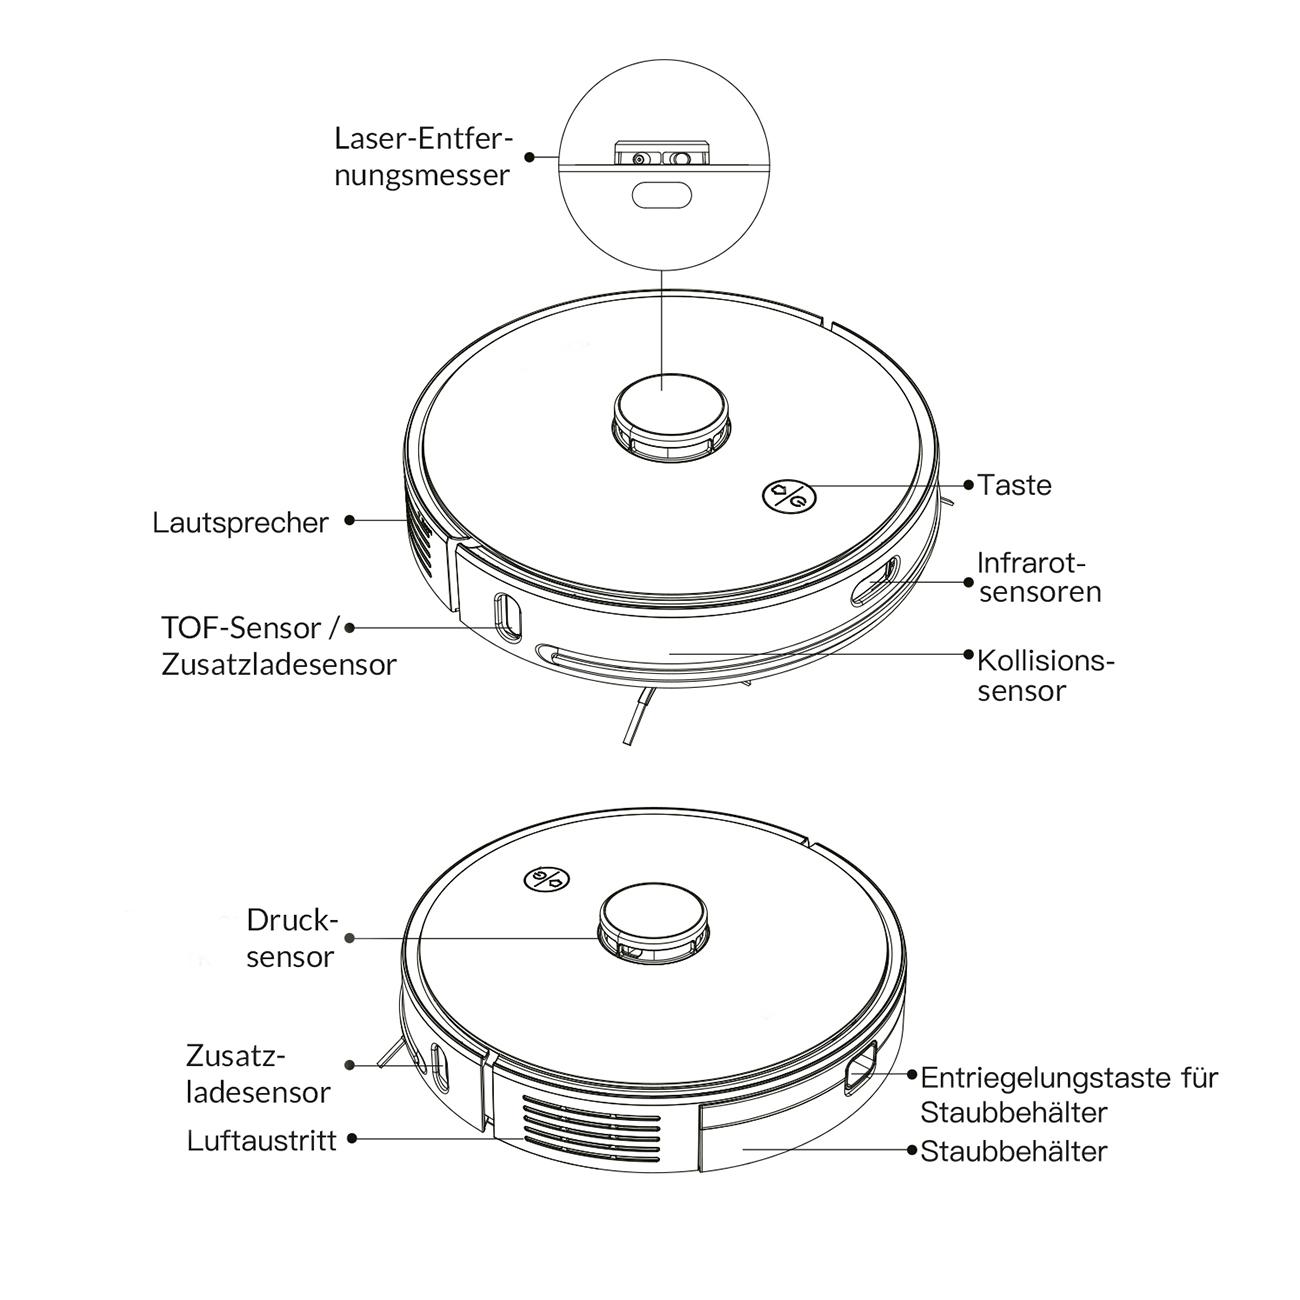 Vactronic Saugroboter Skizze mit Beschriftung